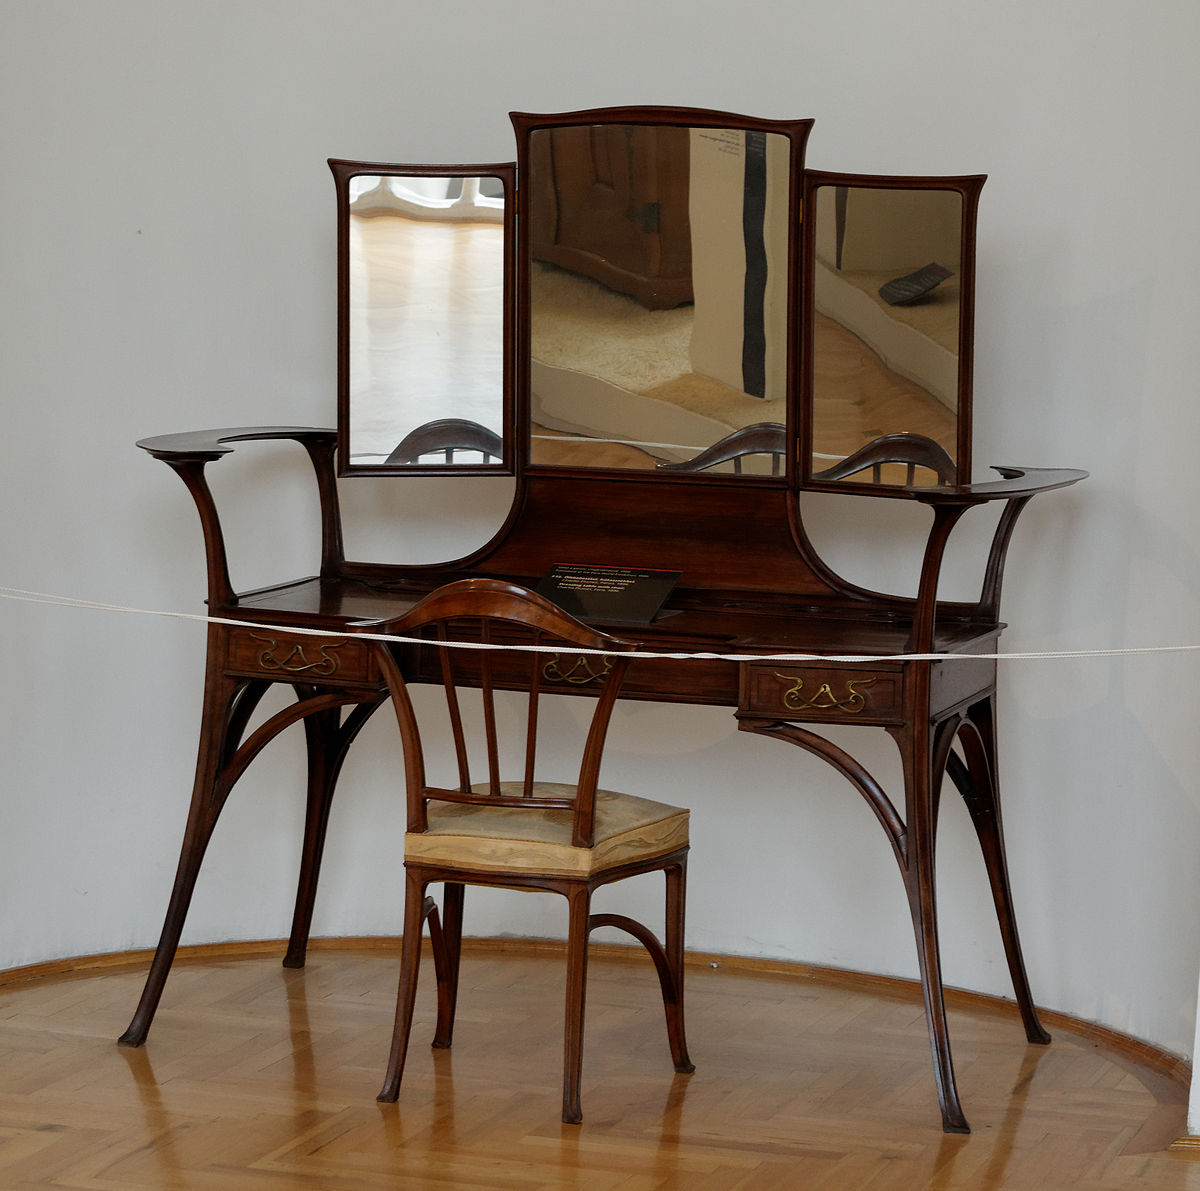 vanity table chair john deere rocking cushion - wiktionary